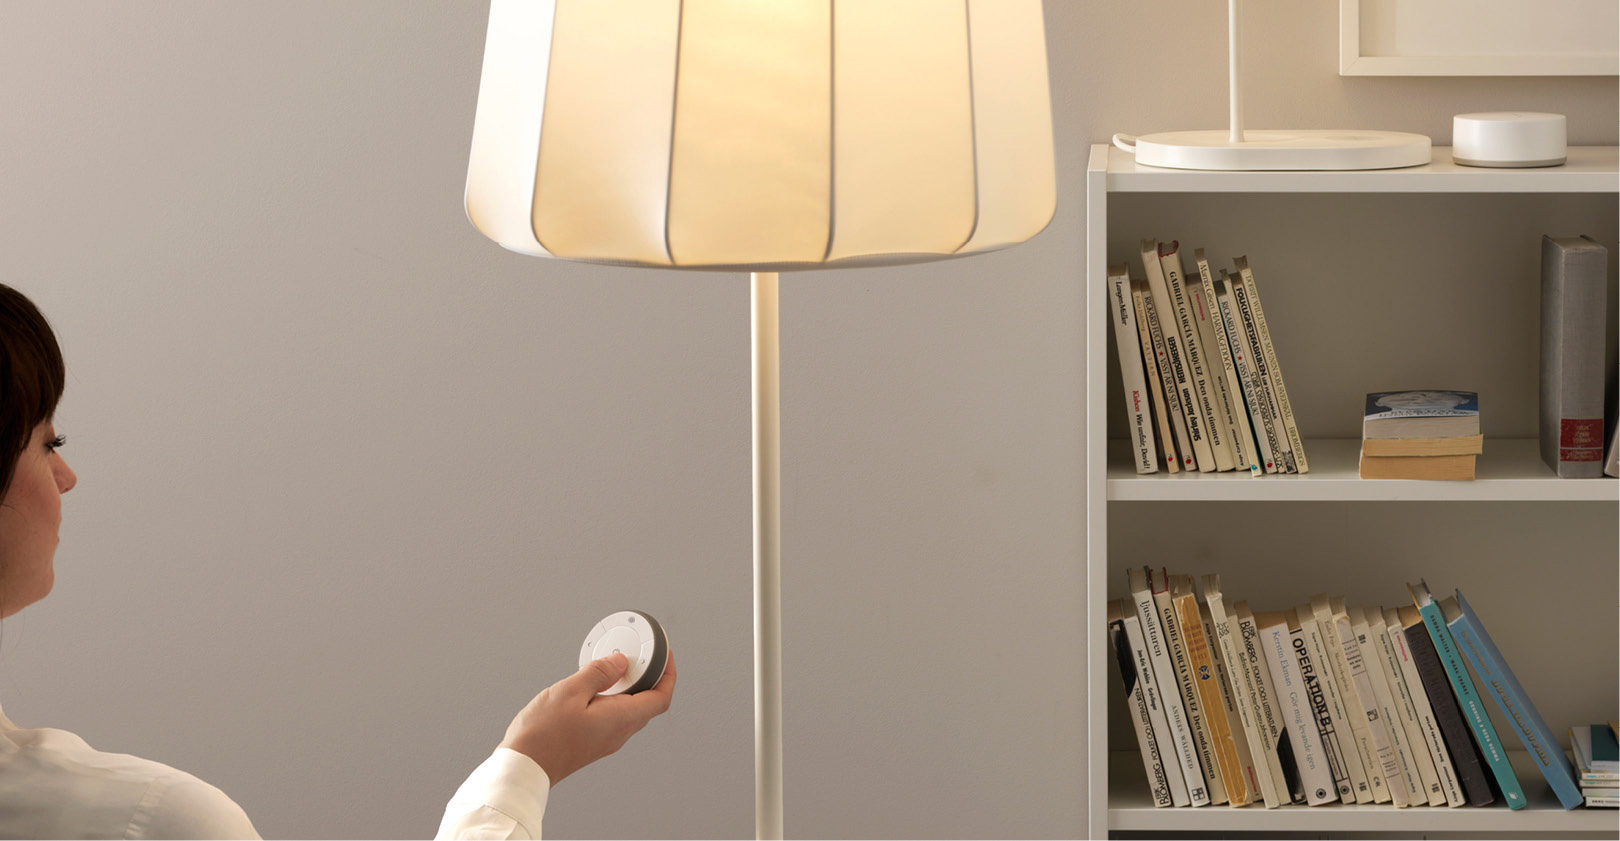 ikea smart lighting and wireless LED light bulbs